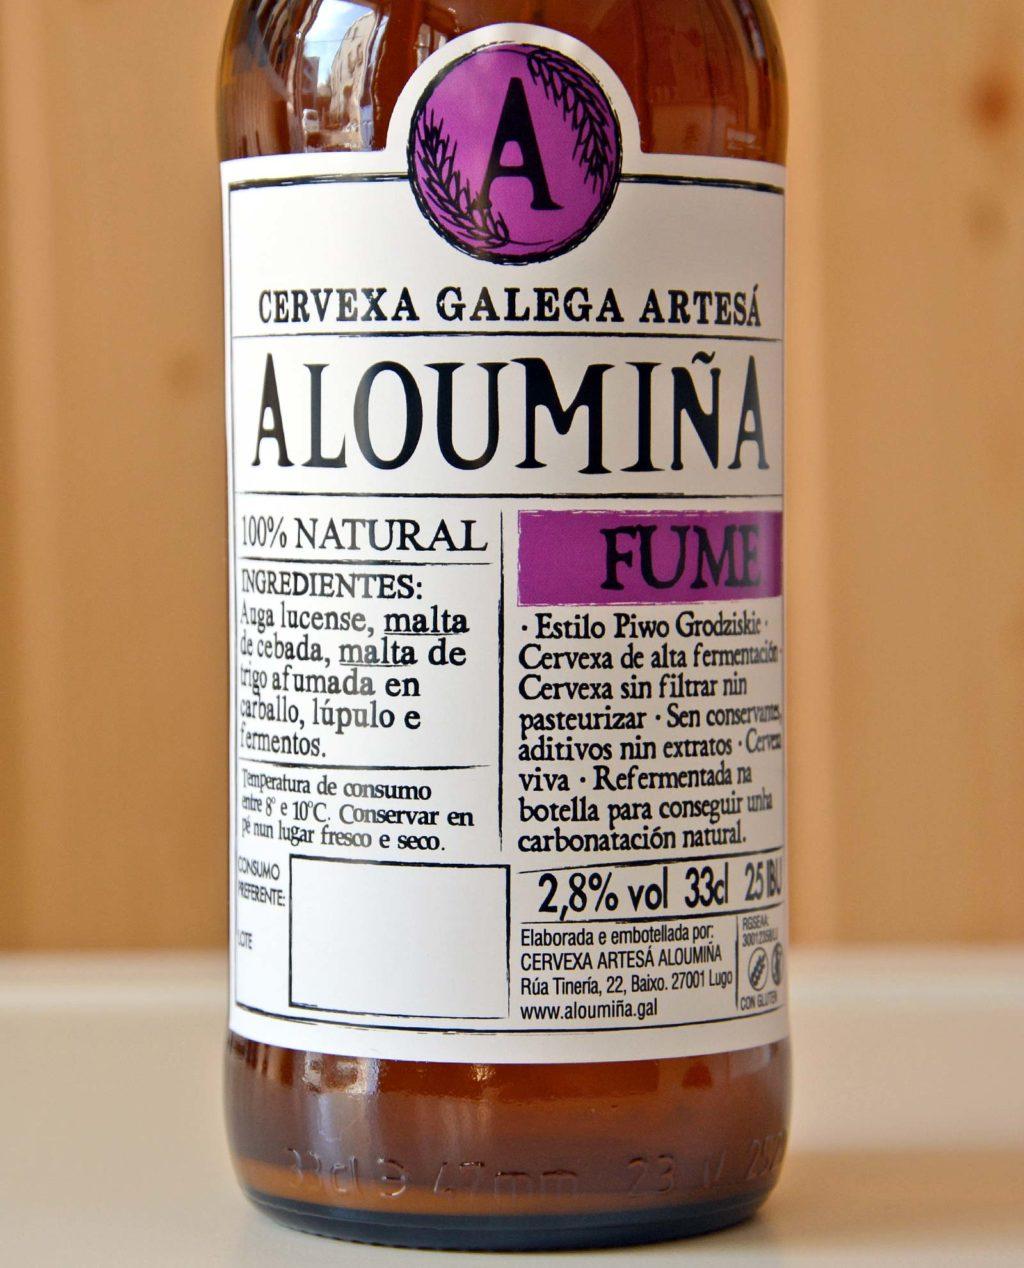 aloumina-cerveza-artesana-craft-beer-lugo-galicia-fume-piwo-grodziskie-001